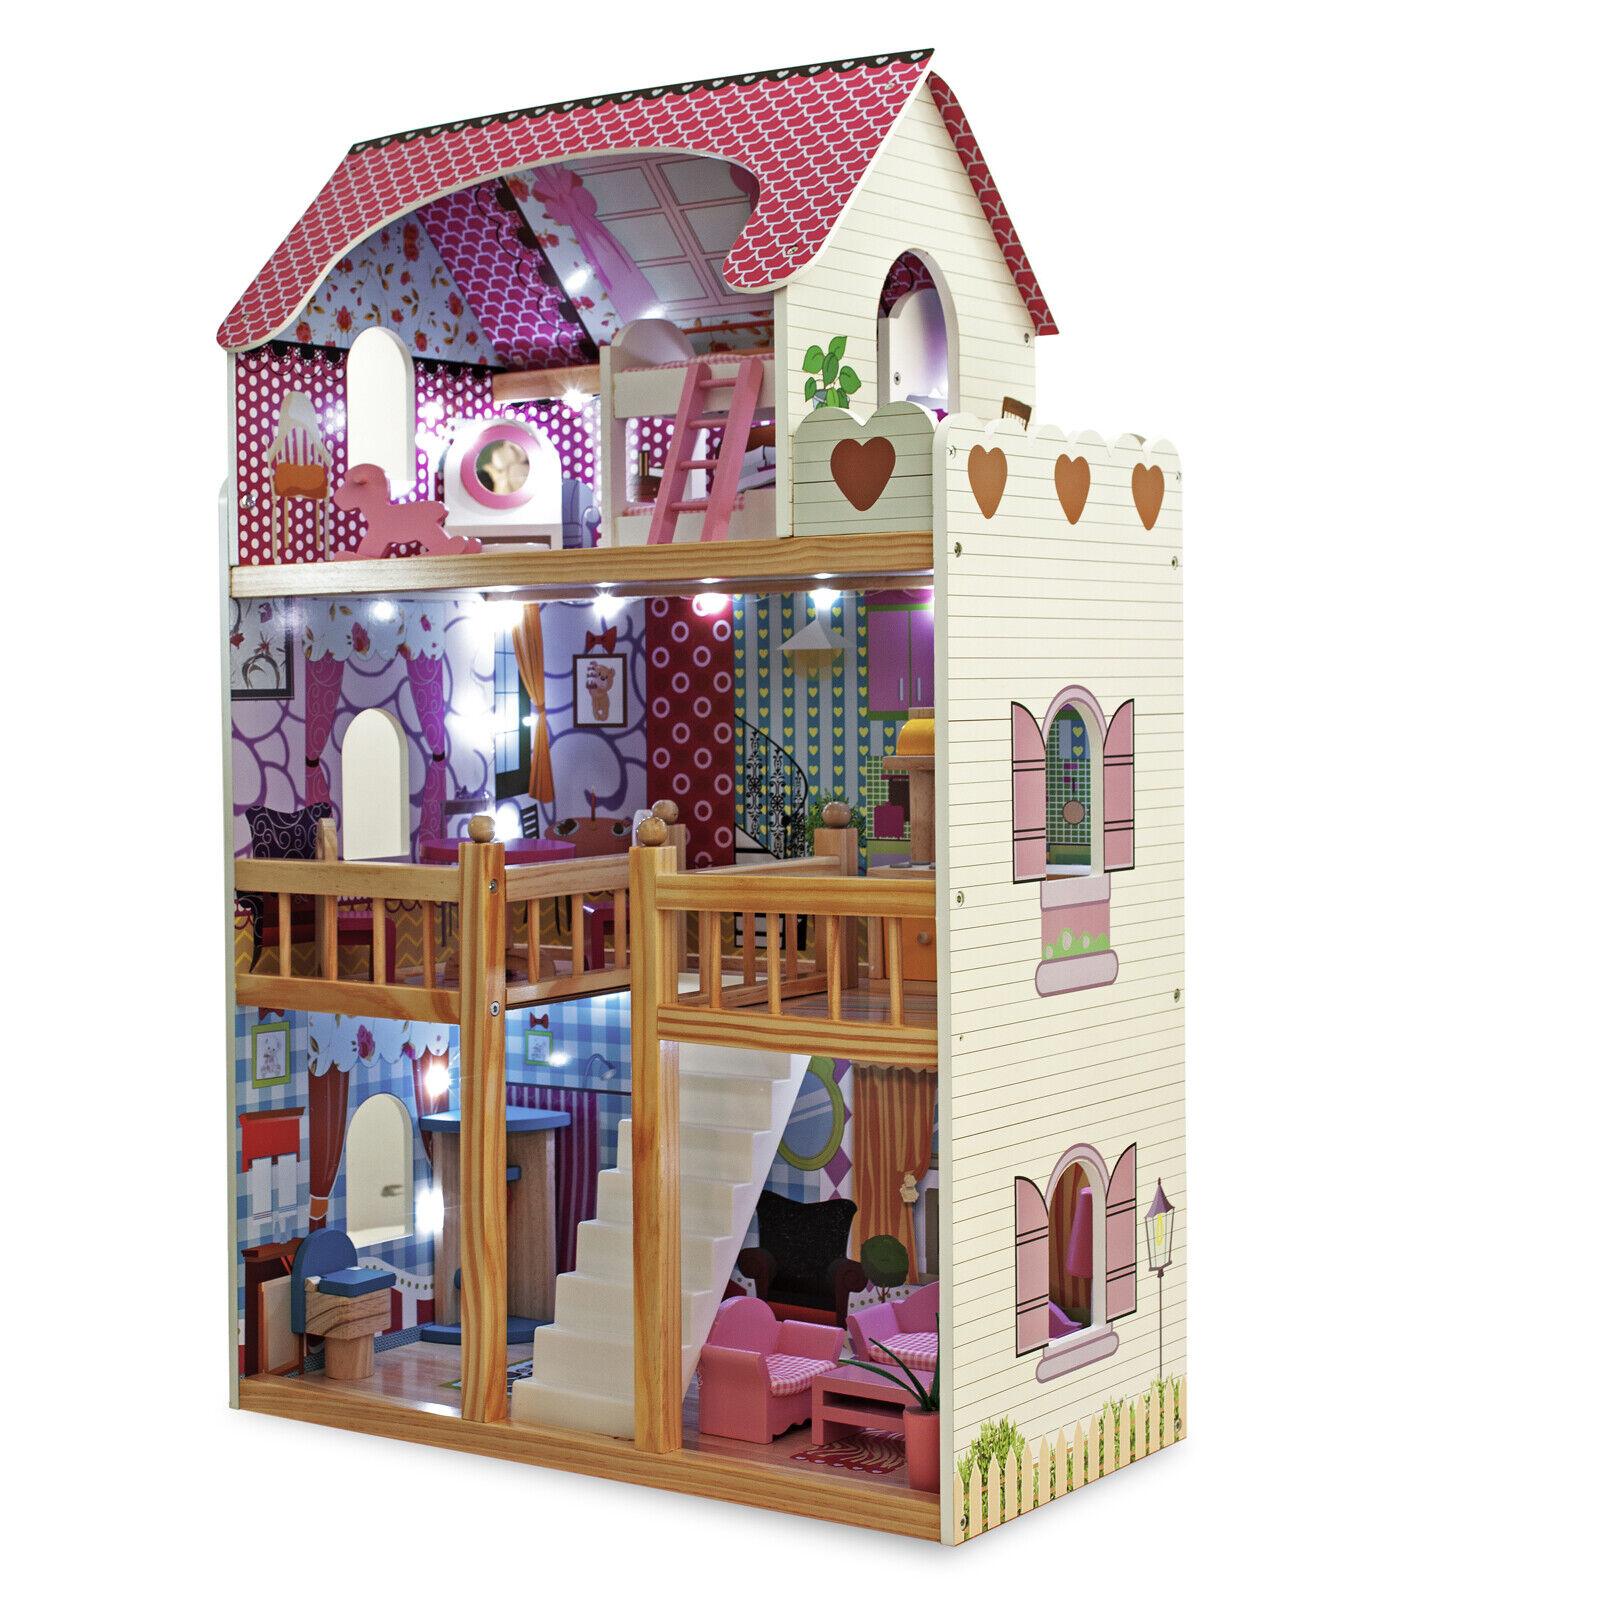 Spielzeughaus Puppenhaus Puppenstube Puppenmöbel Puppenvilla mit LED Beleuchtung